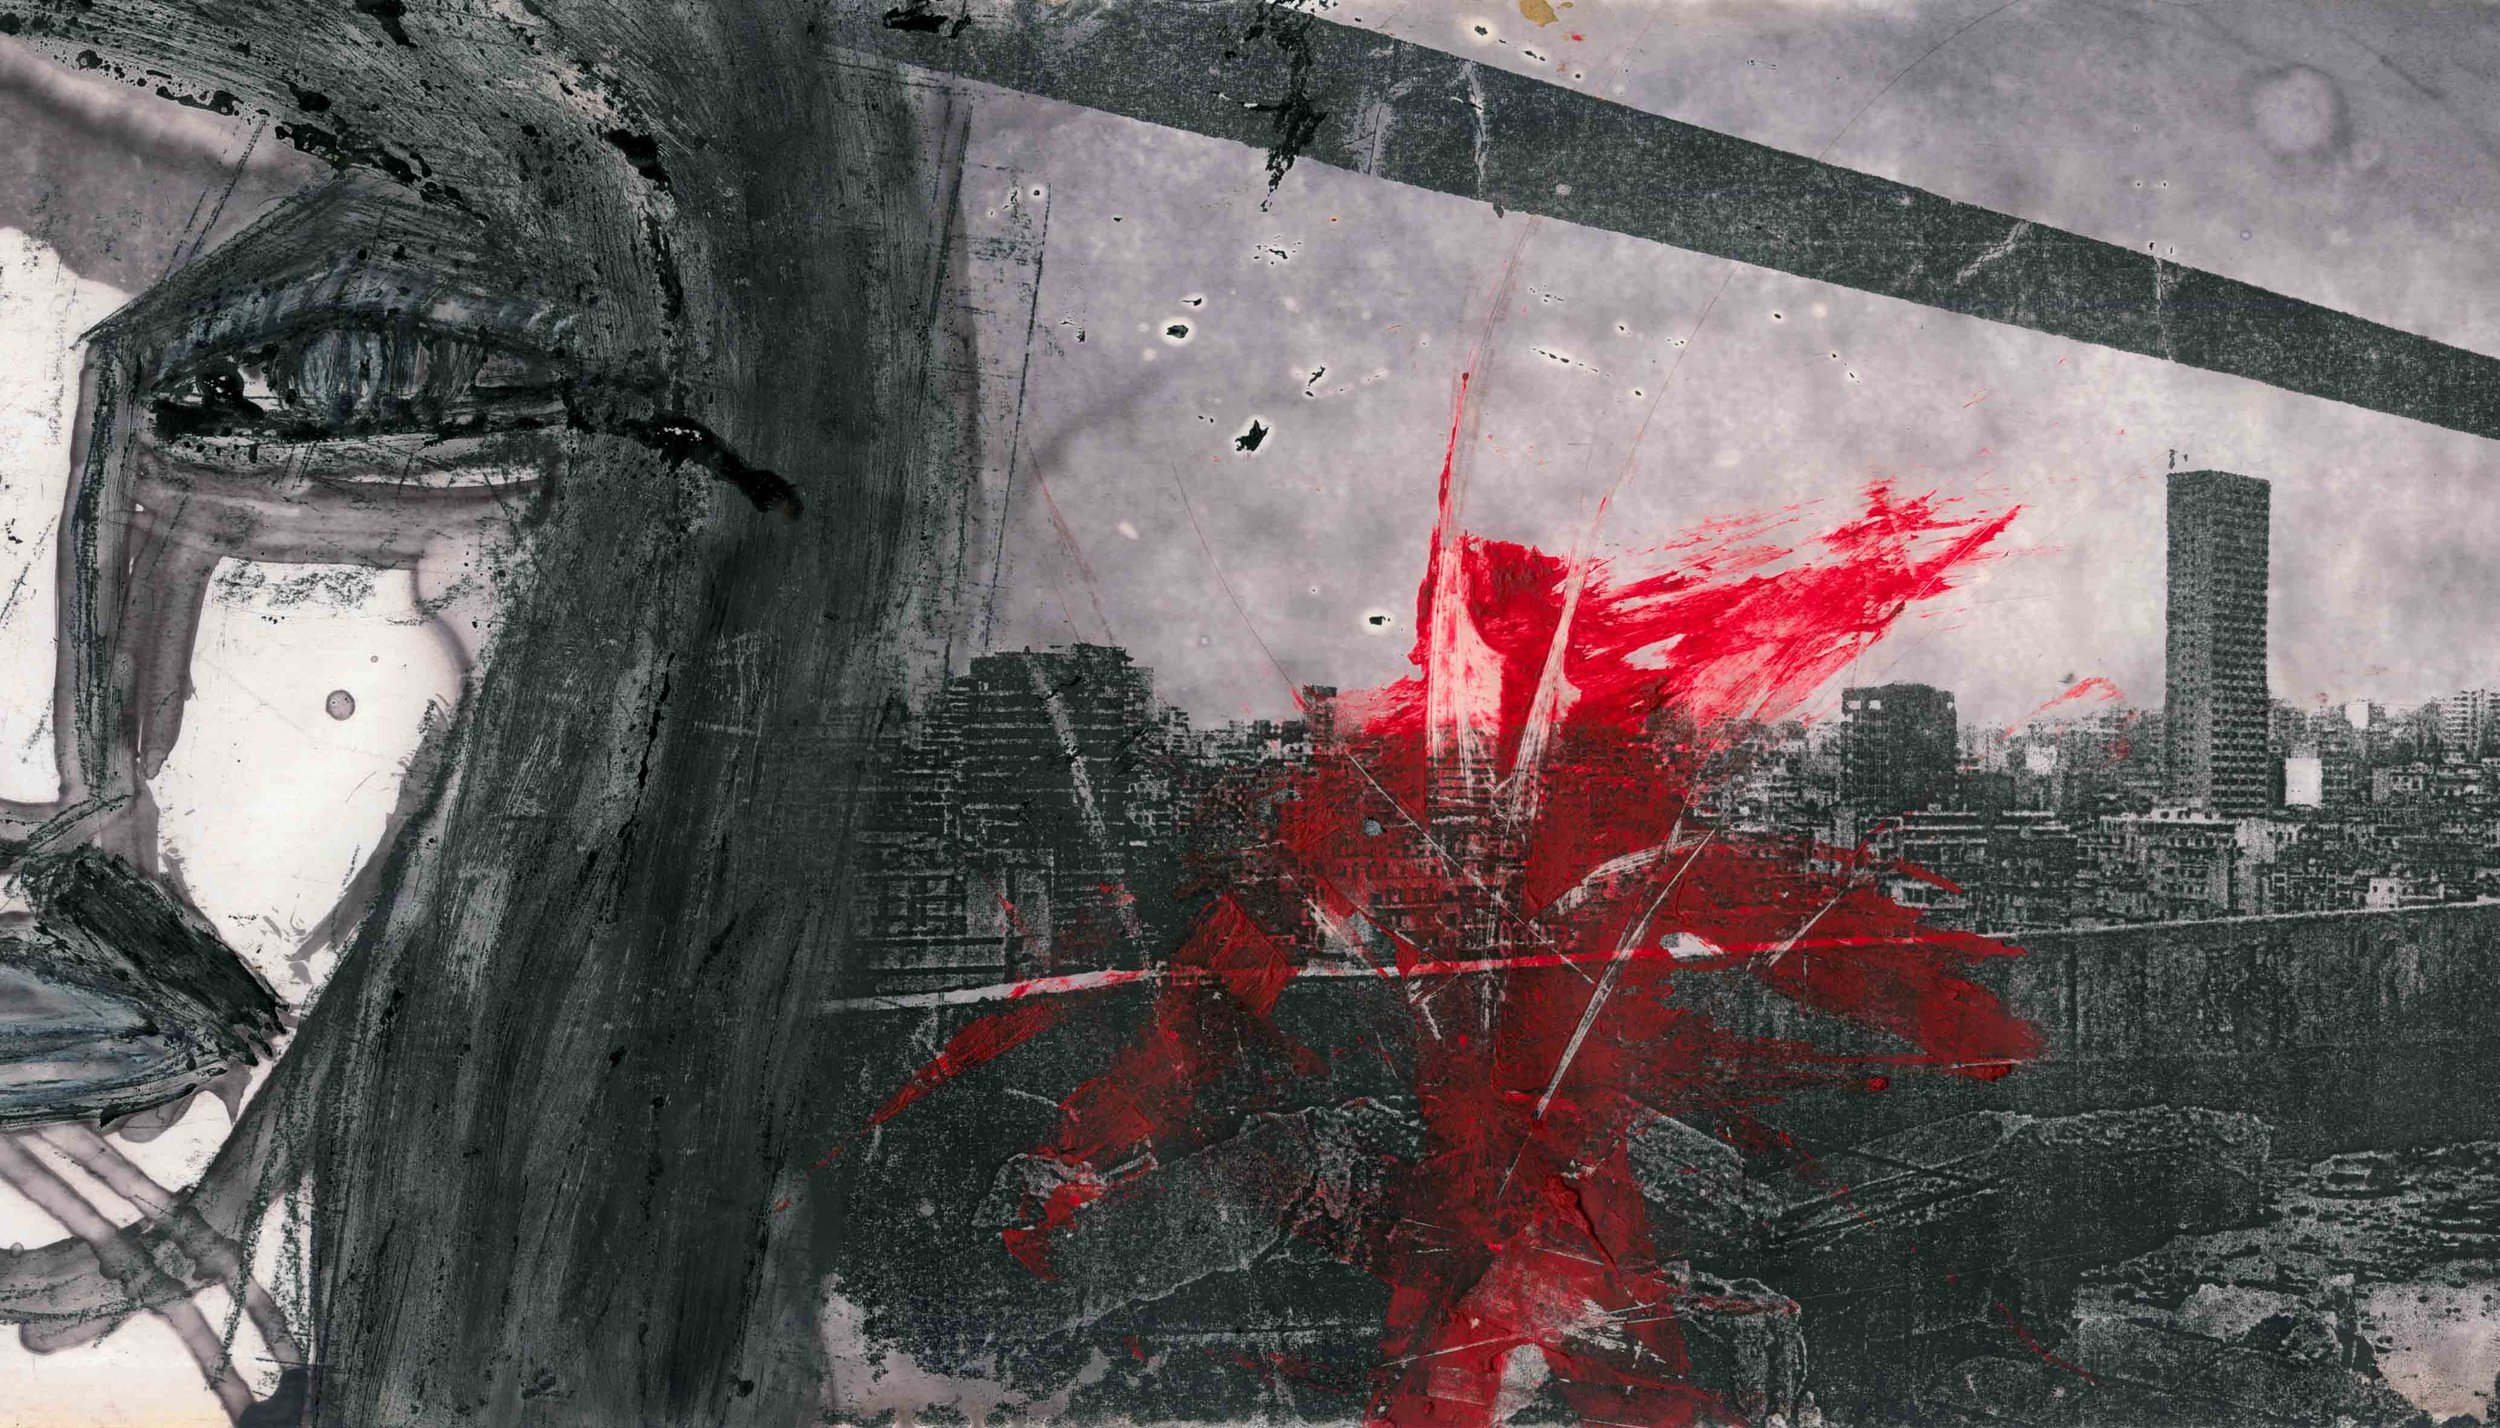 alfred_tarazi_fragments_silent_film_screen_37.jpg